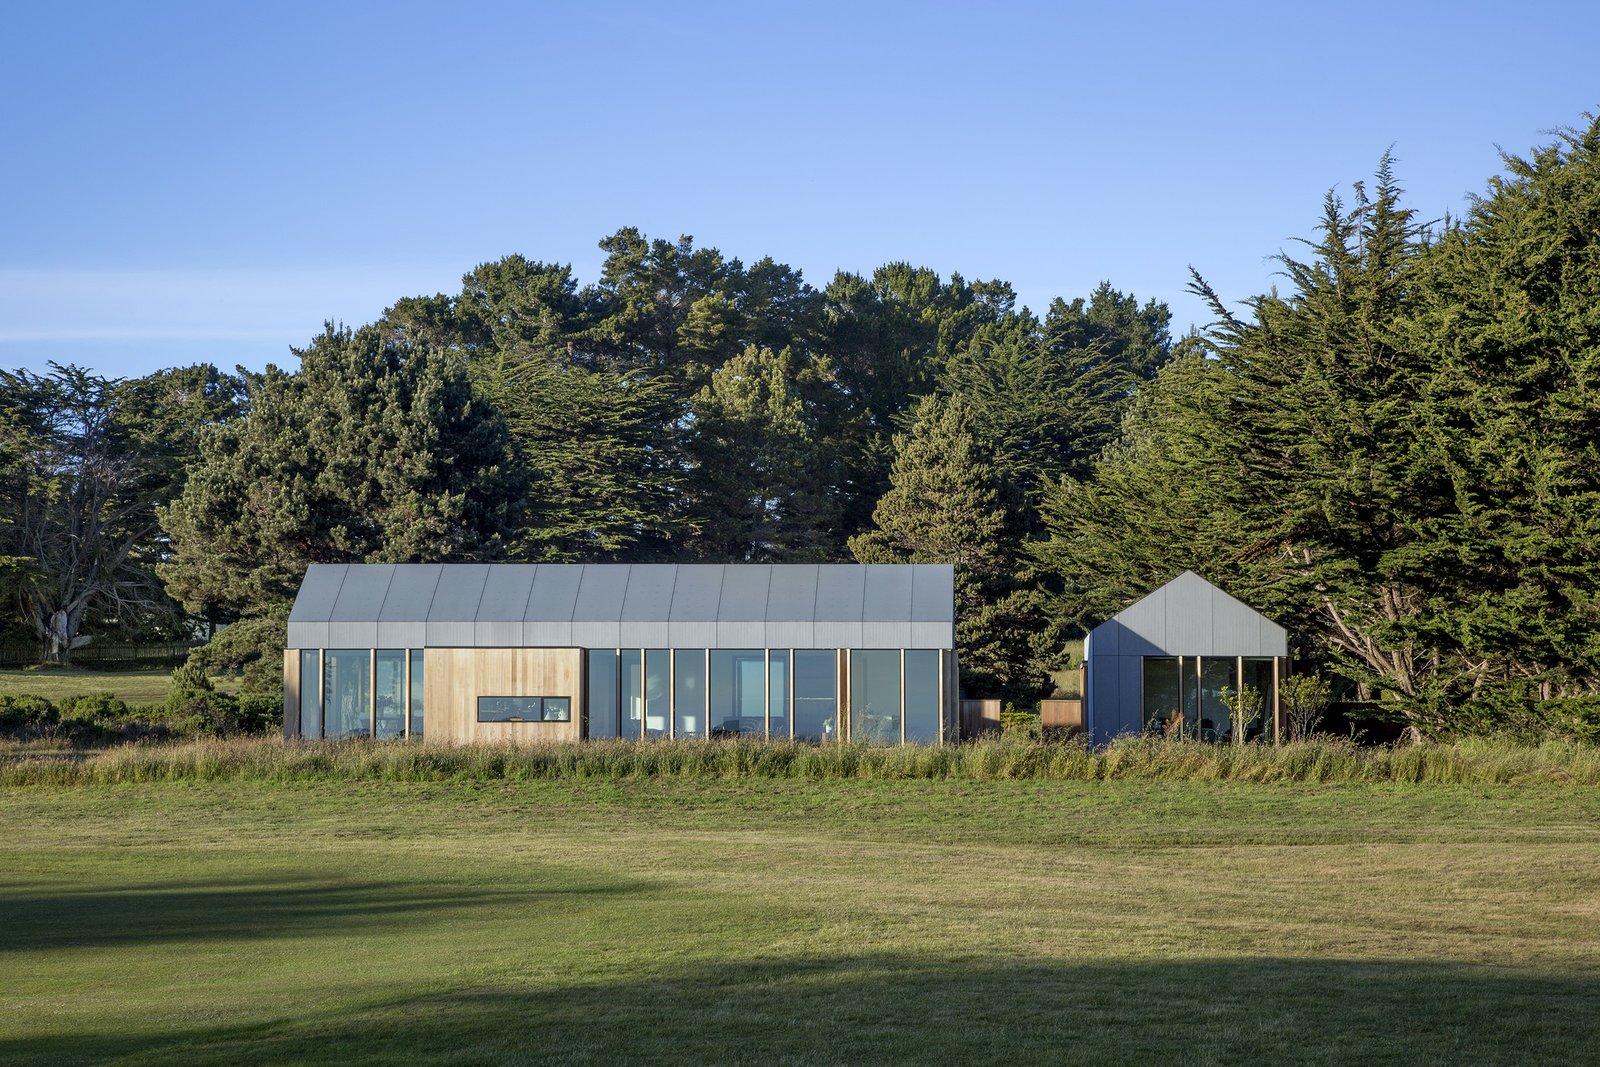 Skyfall Residence by Turnbull Griffin Haesloop Exterior